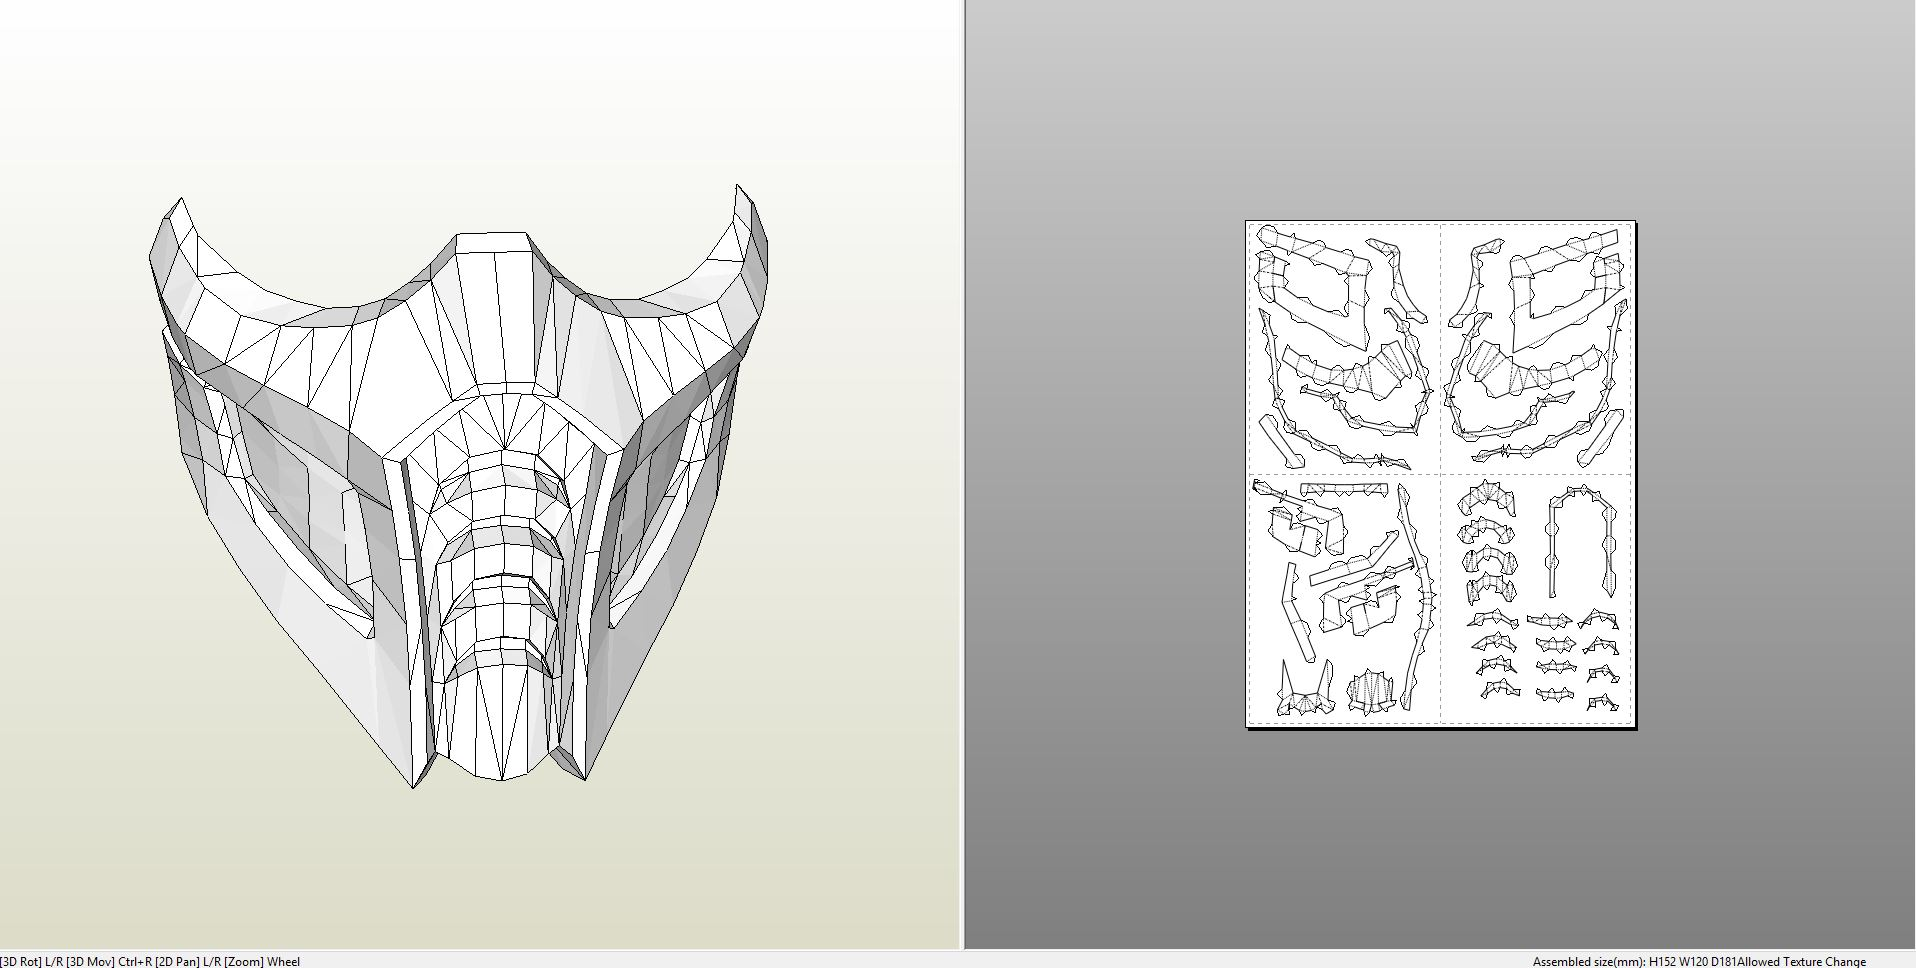 22 images of sub-zero mask template paper | netpei. Com.